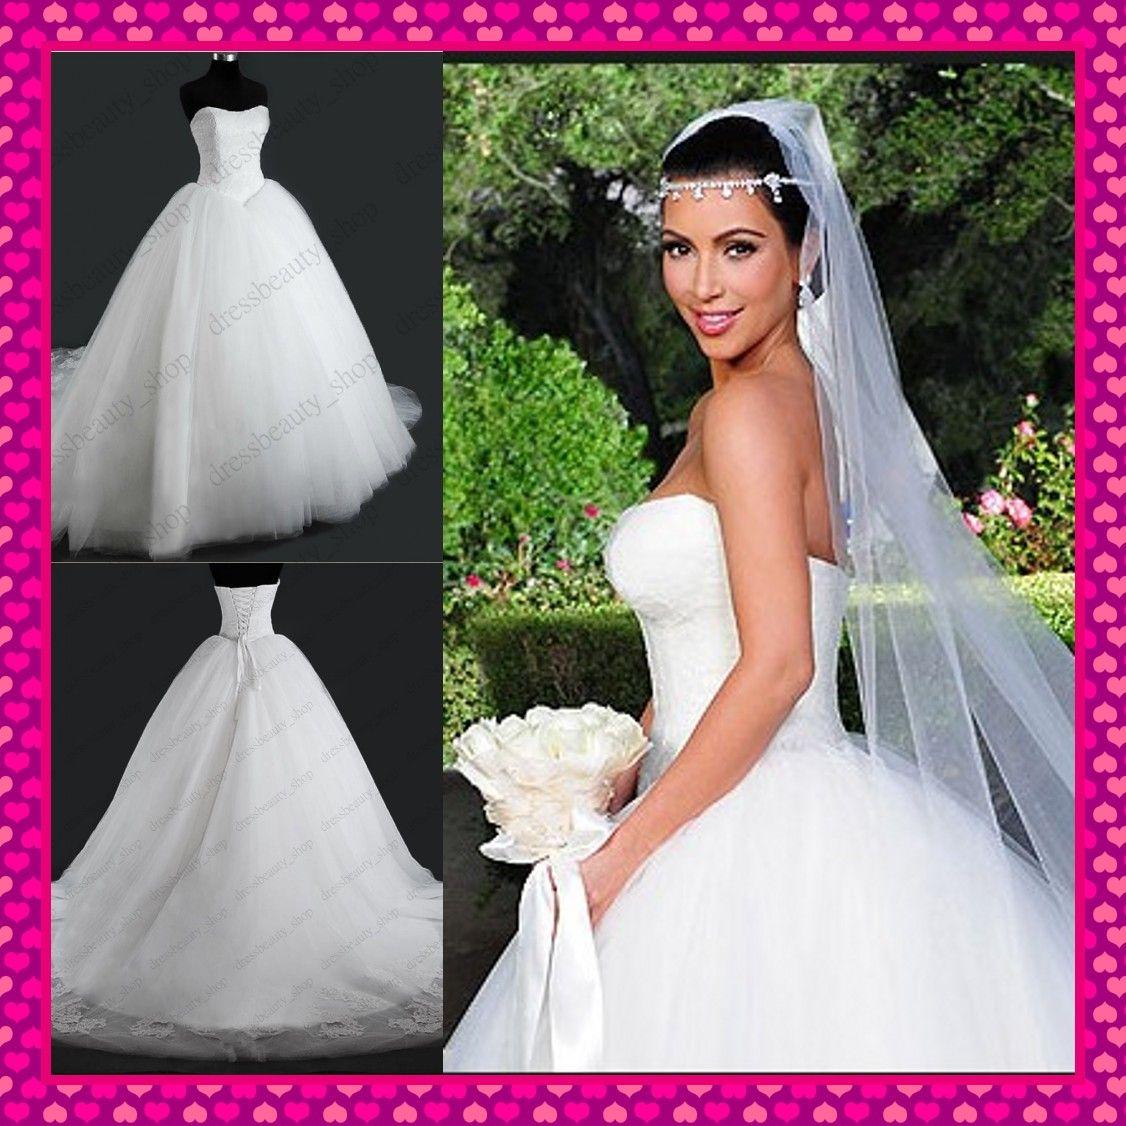 Kim Kardashian Inspired Corset And Tulle Ball Gown Wedding Dresses ...